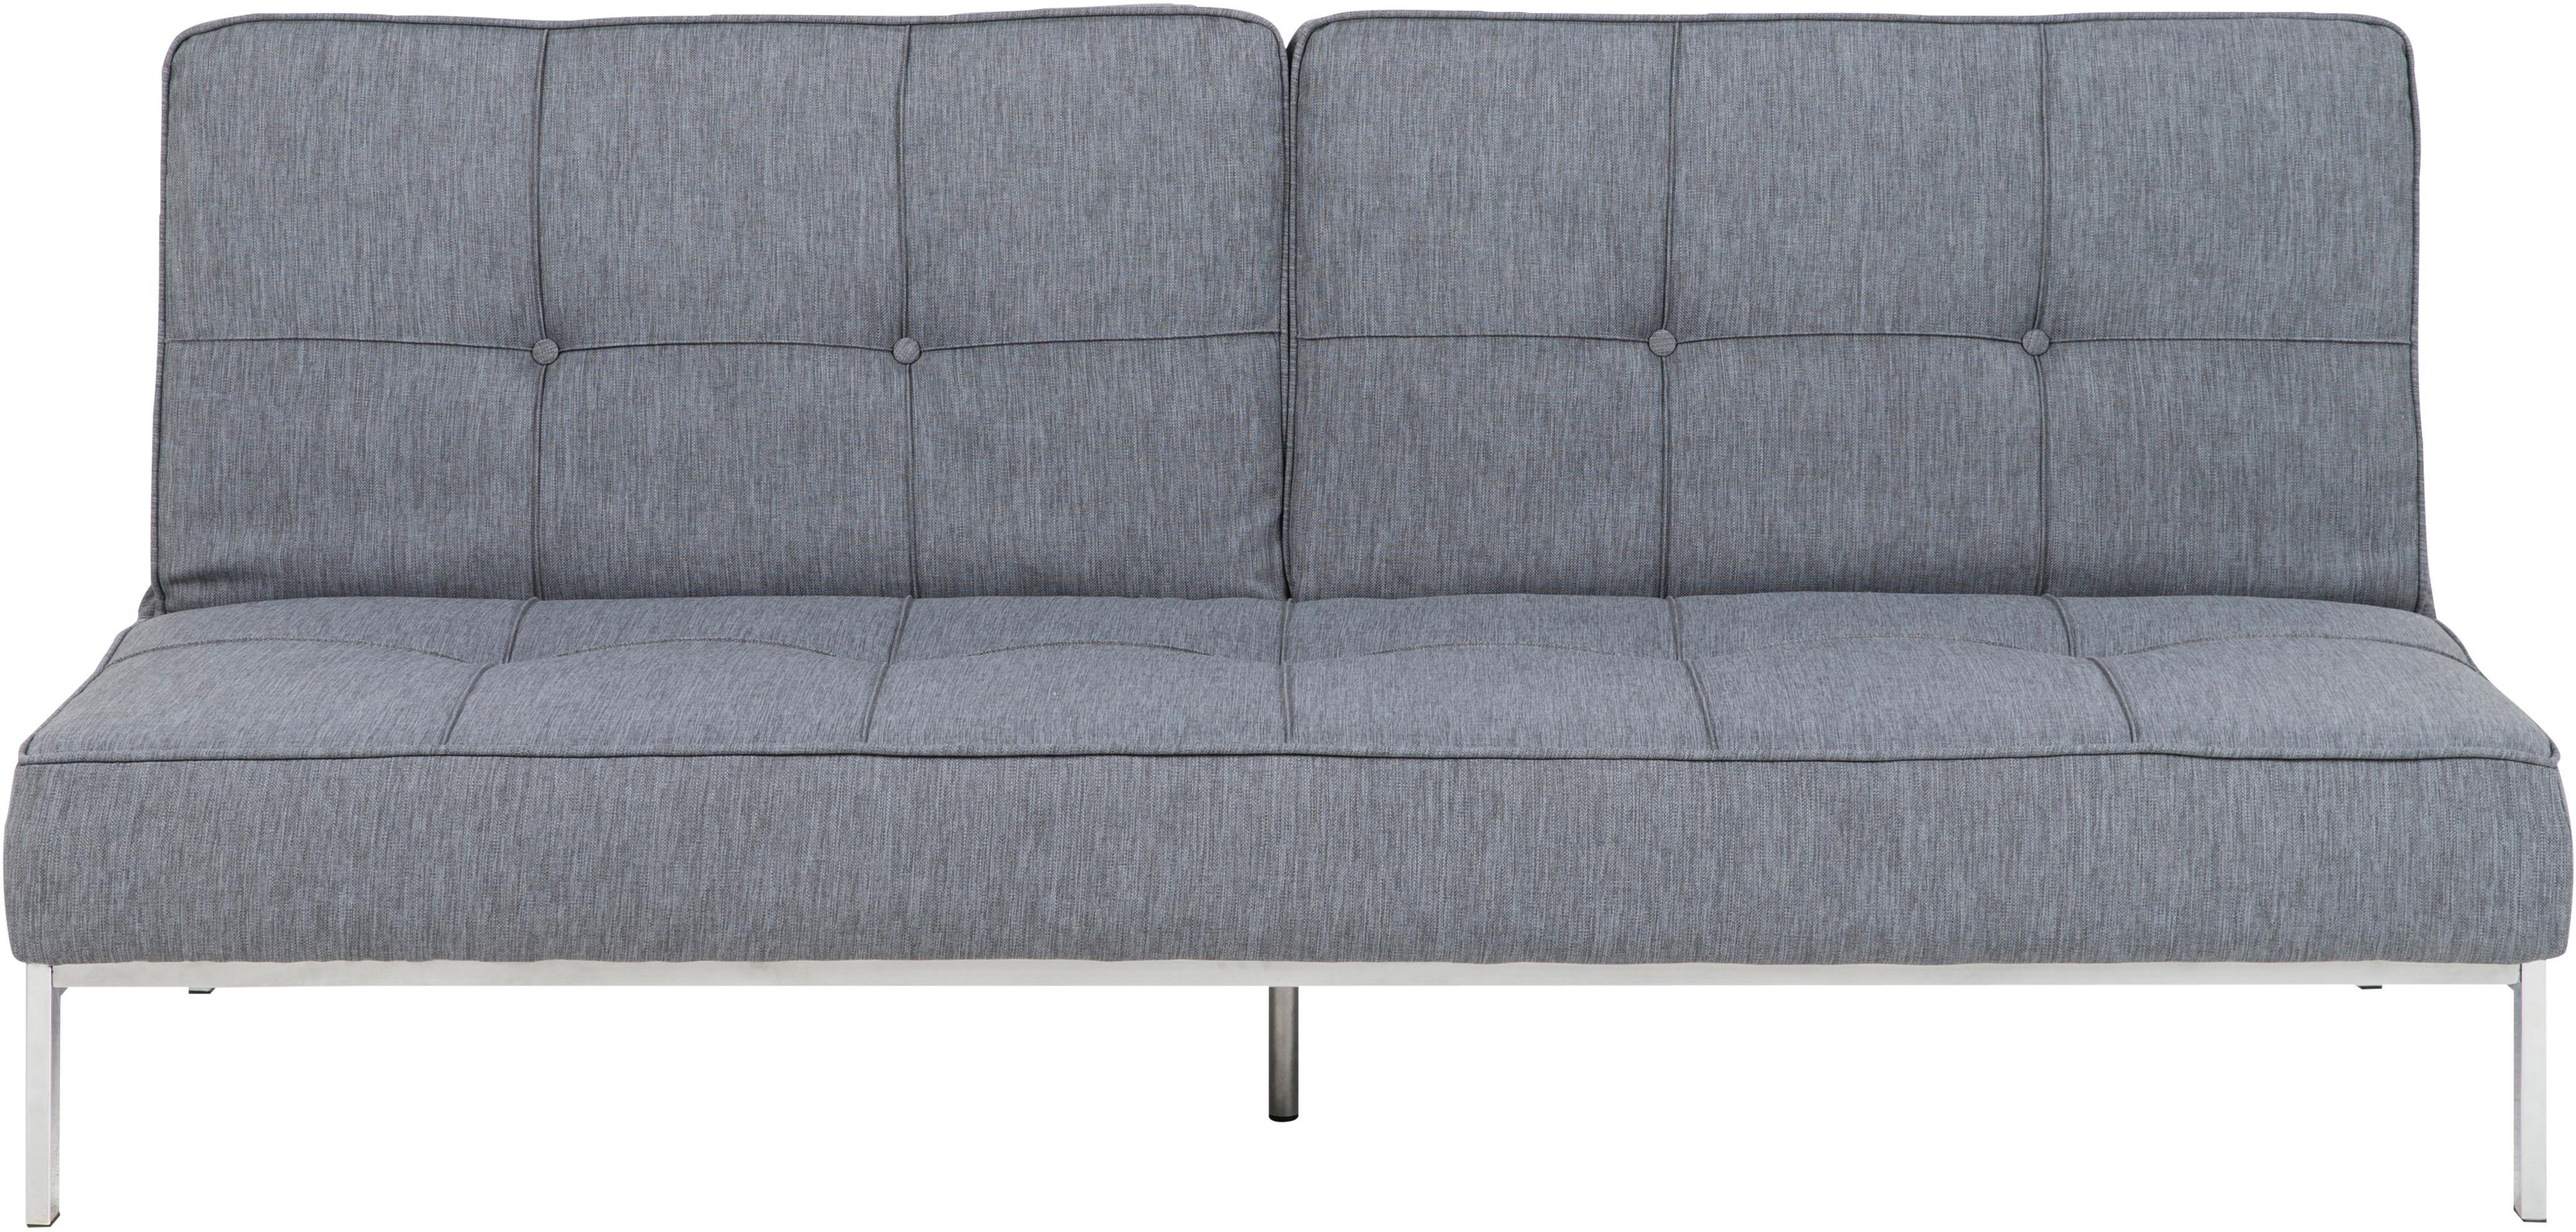 Schlafsofa Perugia in Grau, Bezug: Polyester Der hochwertige, Füße: Metall, lackiert, Hellgrau, B 198 x T 95 cm